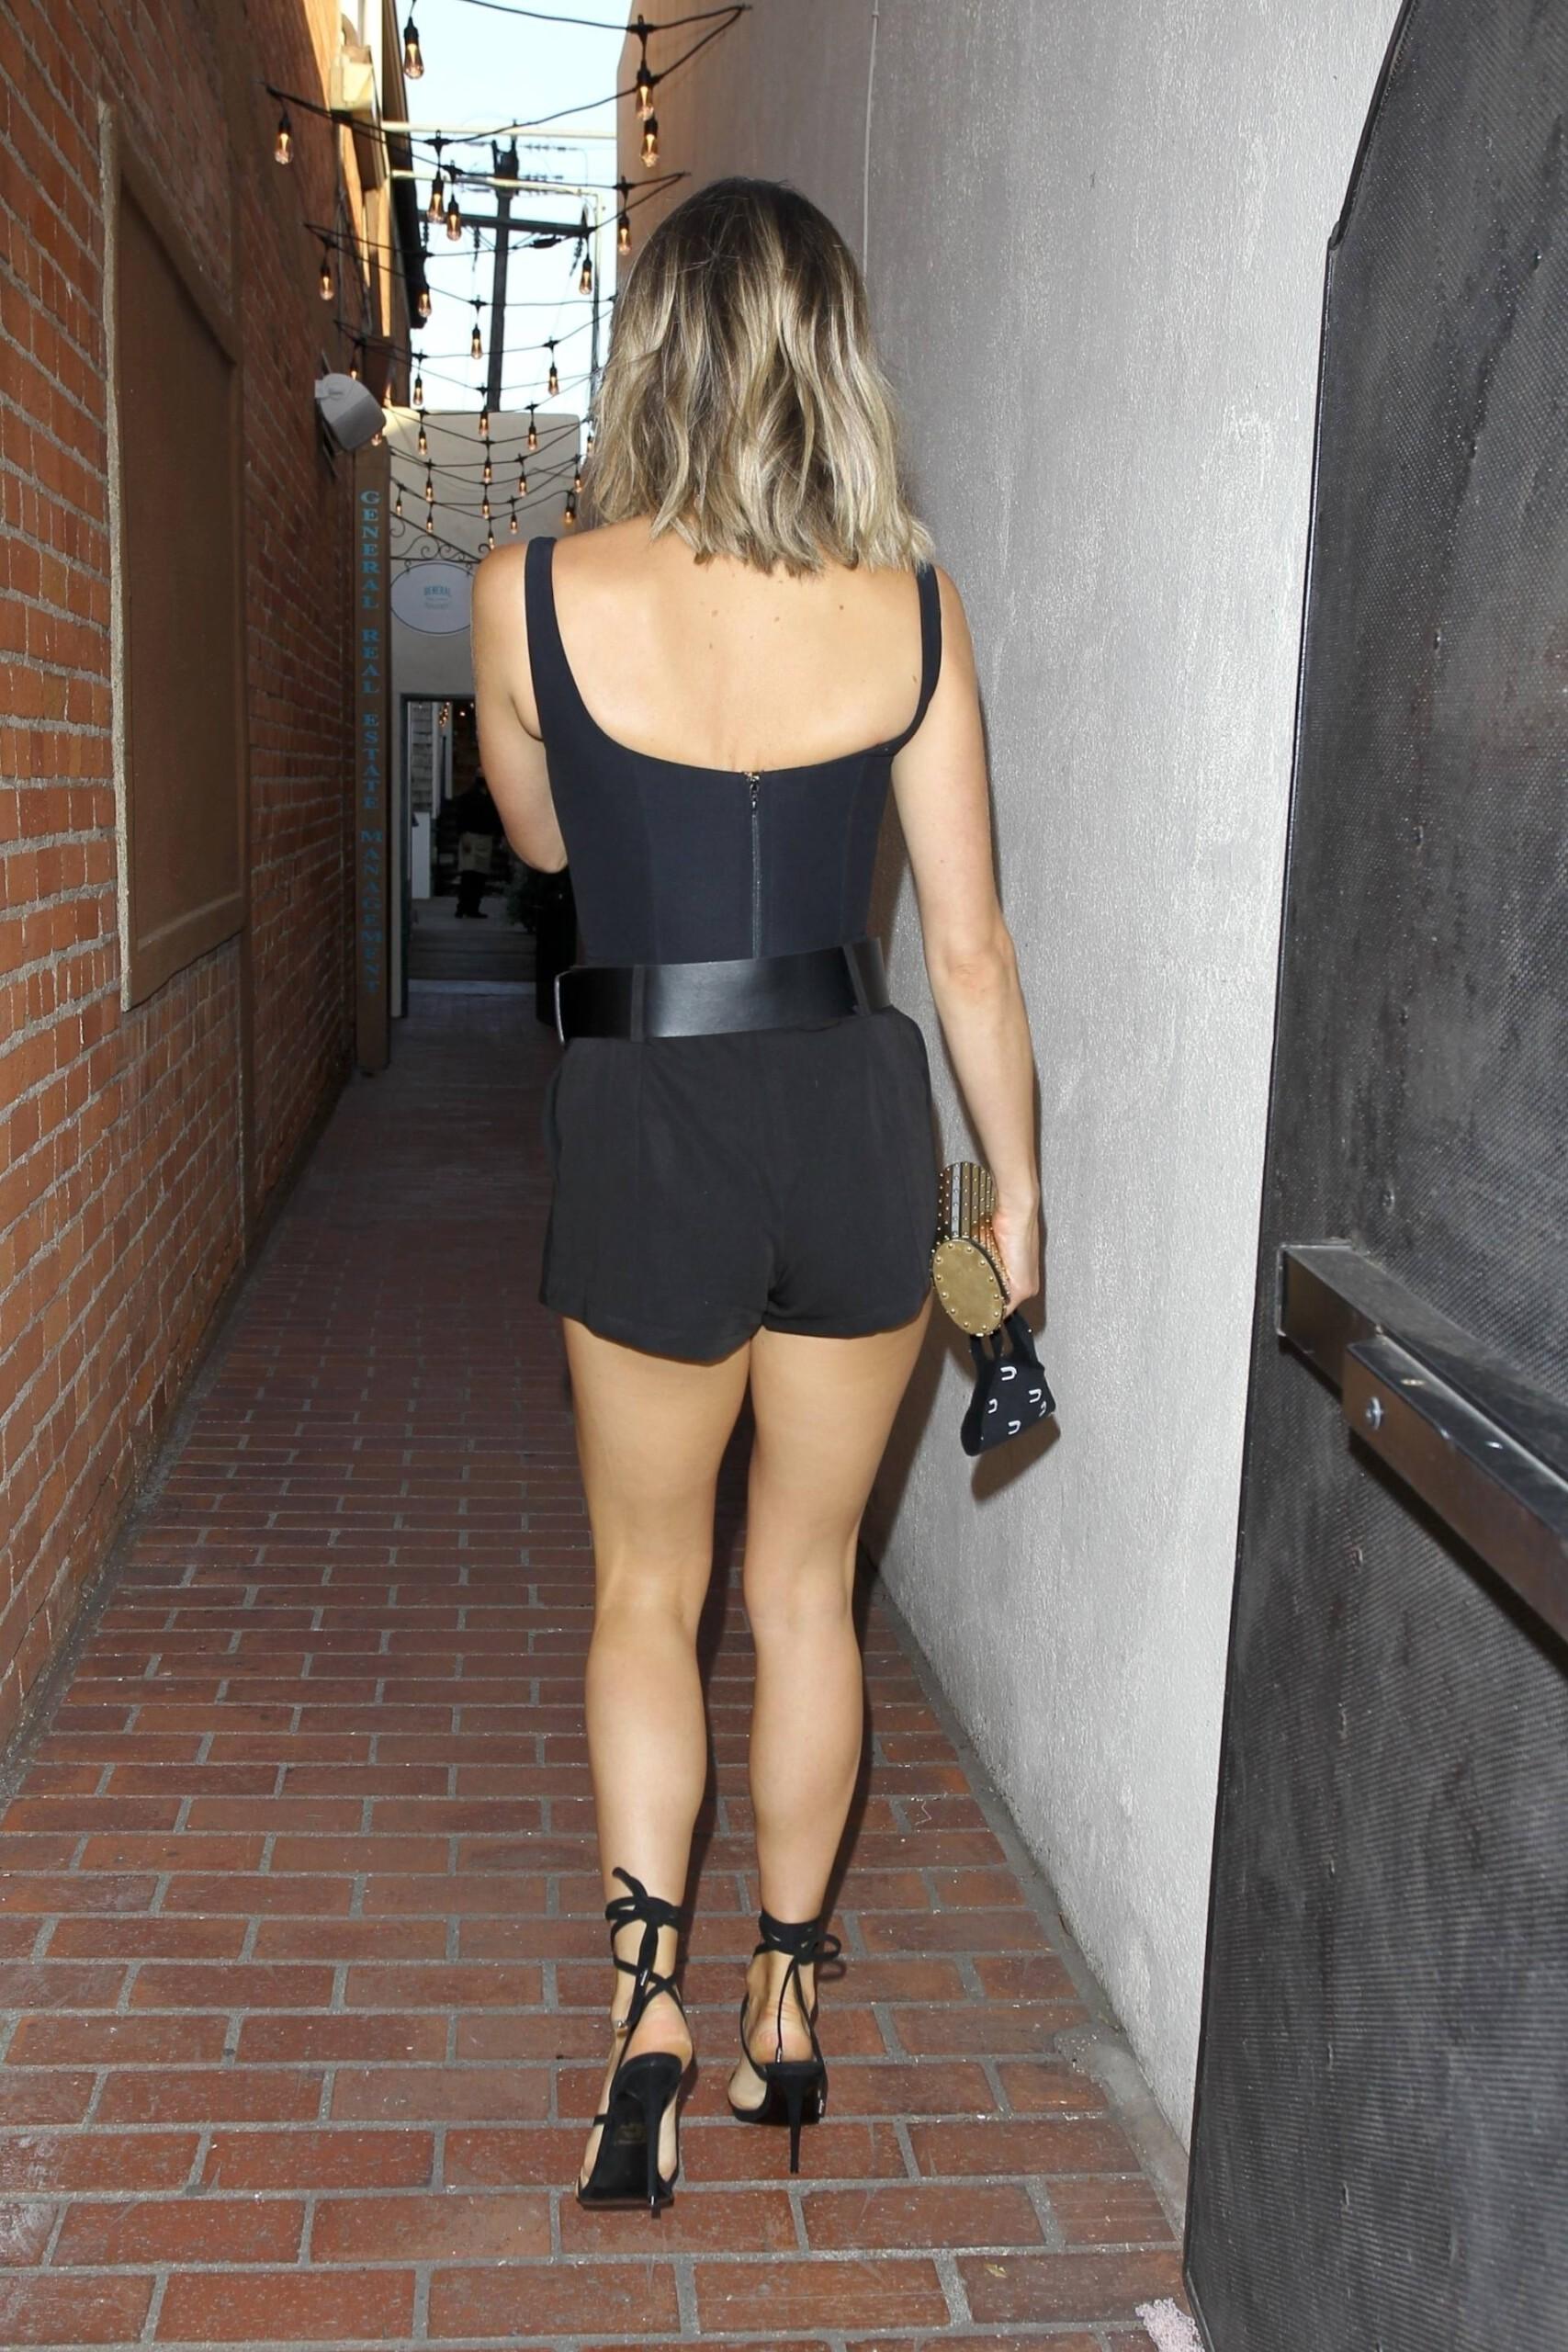 Kristin Cavallari – Sexy Legs And Beautiful Cleavage At Fia In Santa Monica 0010